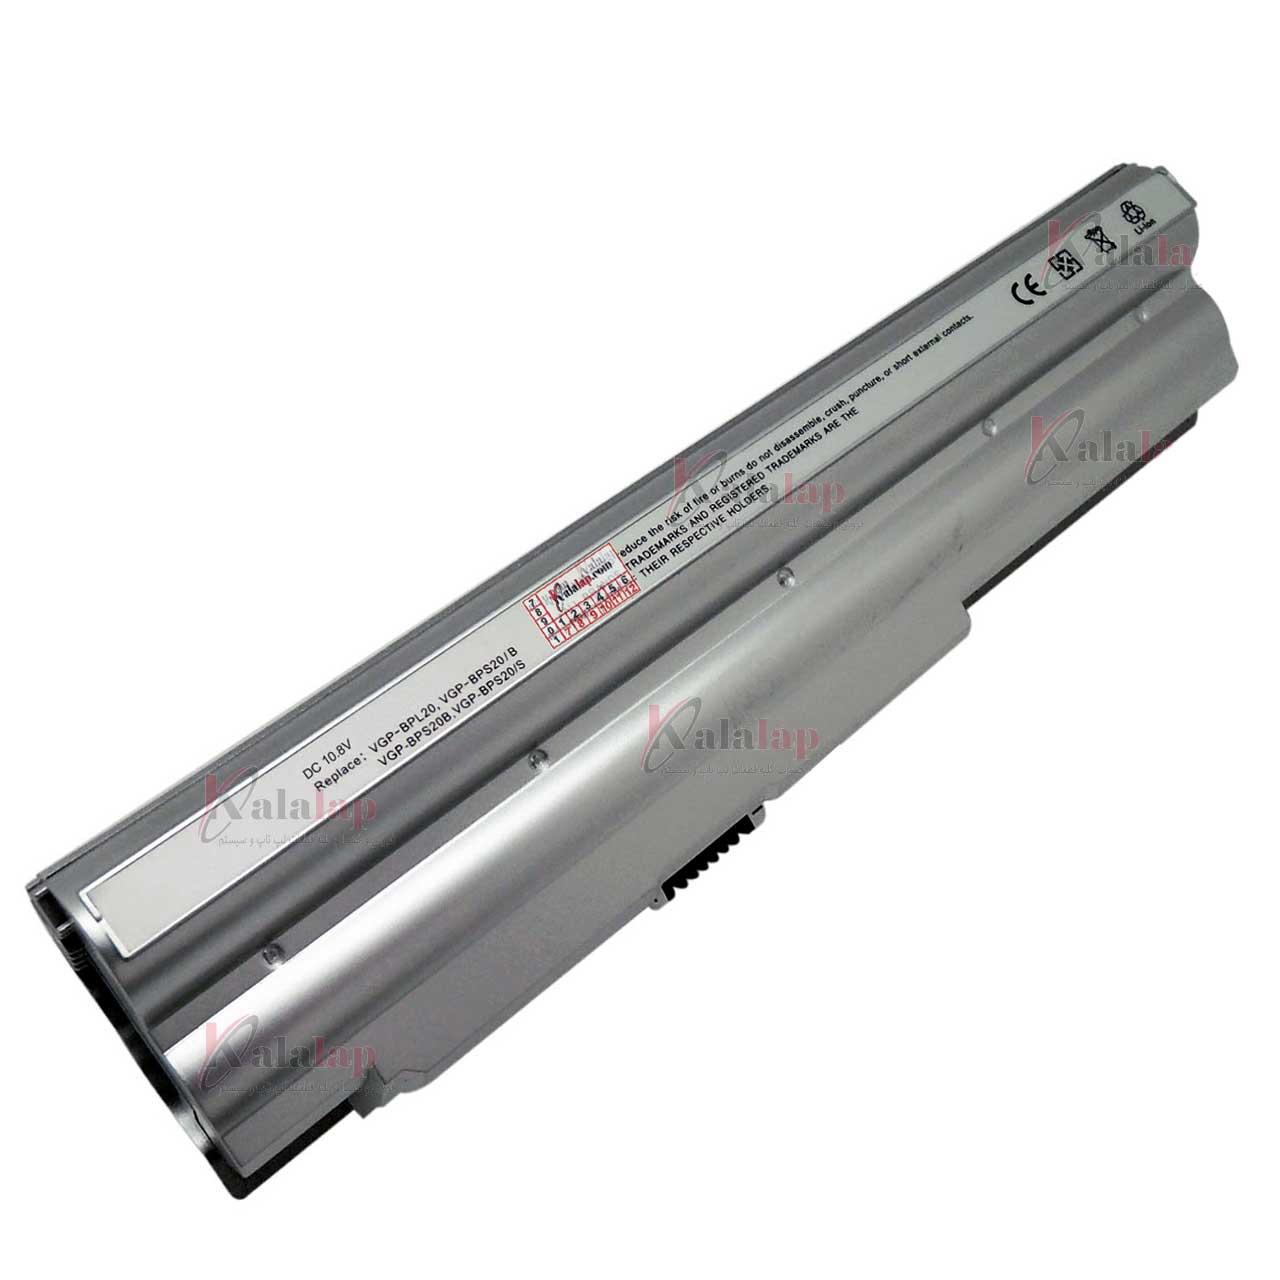 باتری لپتاپ سونی Battery Laptop SONY VGP-BPS20